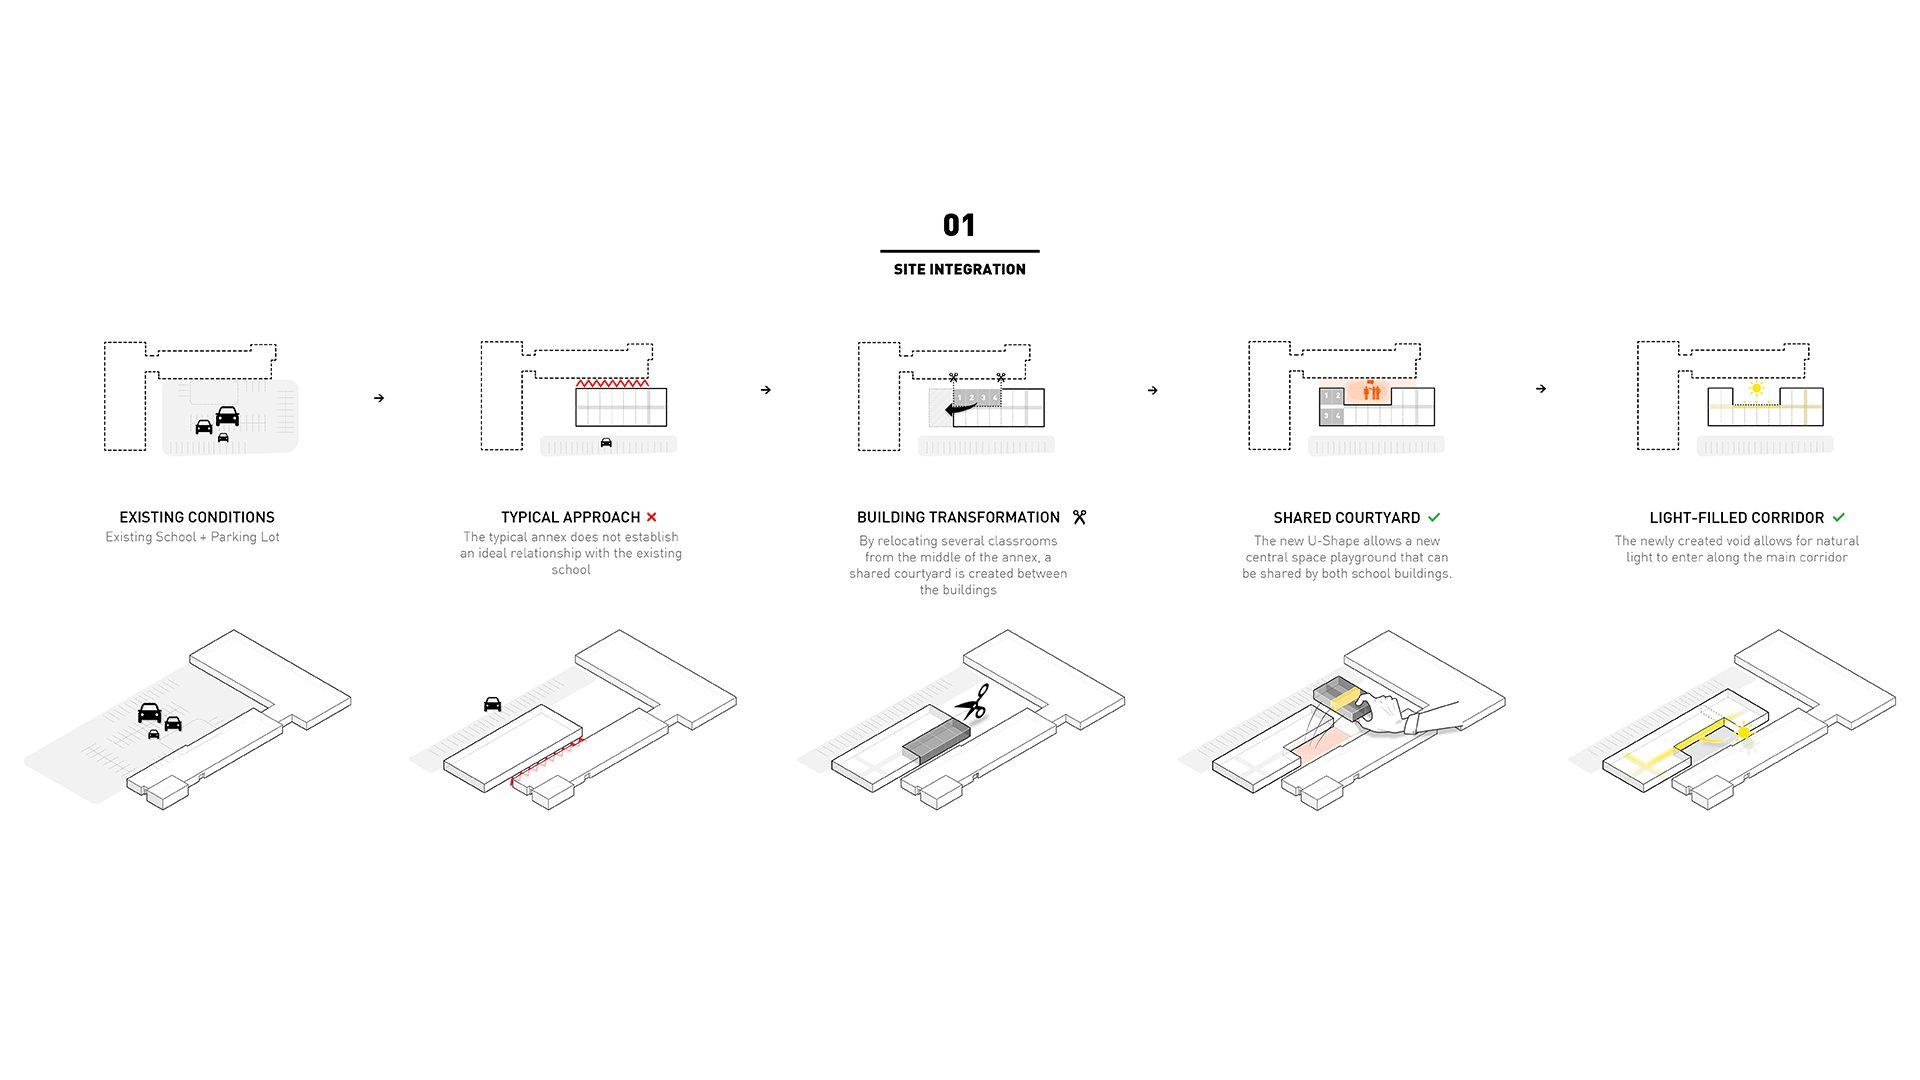 Site Integration